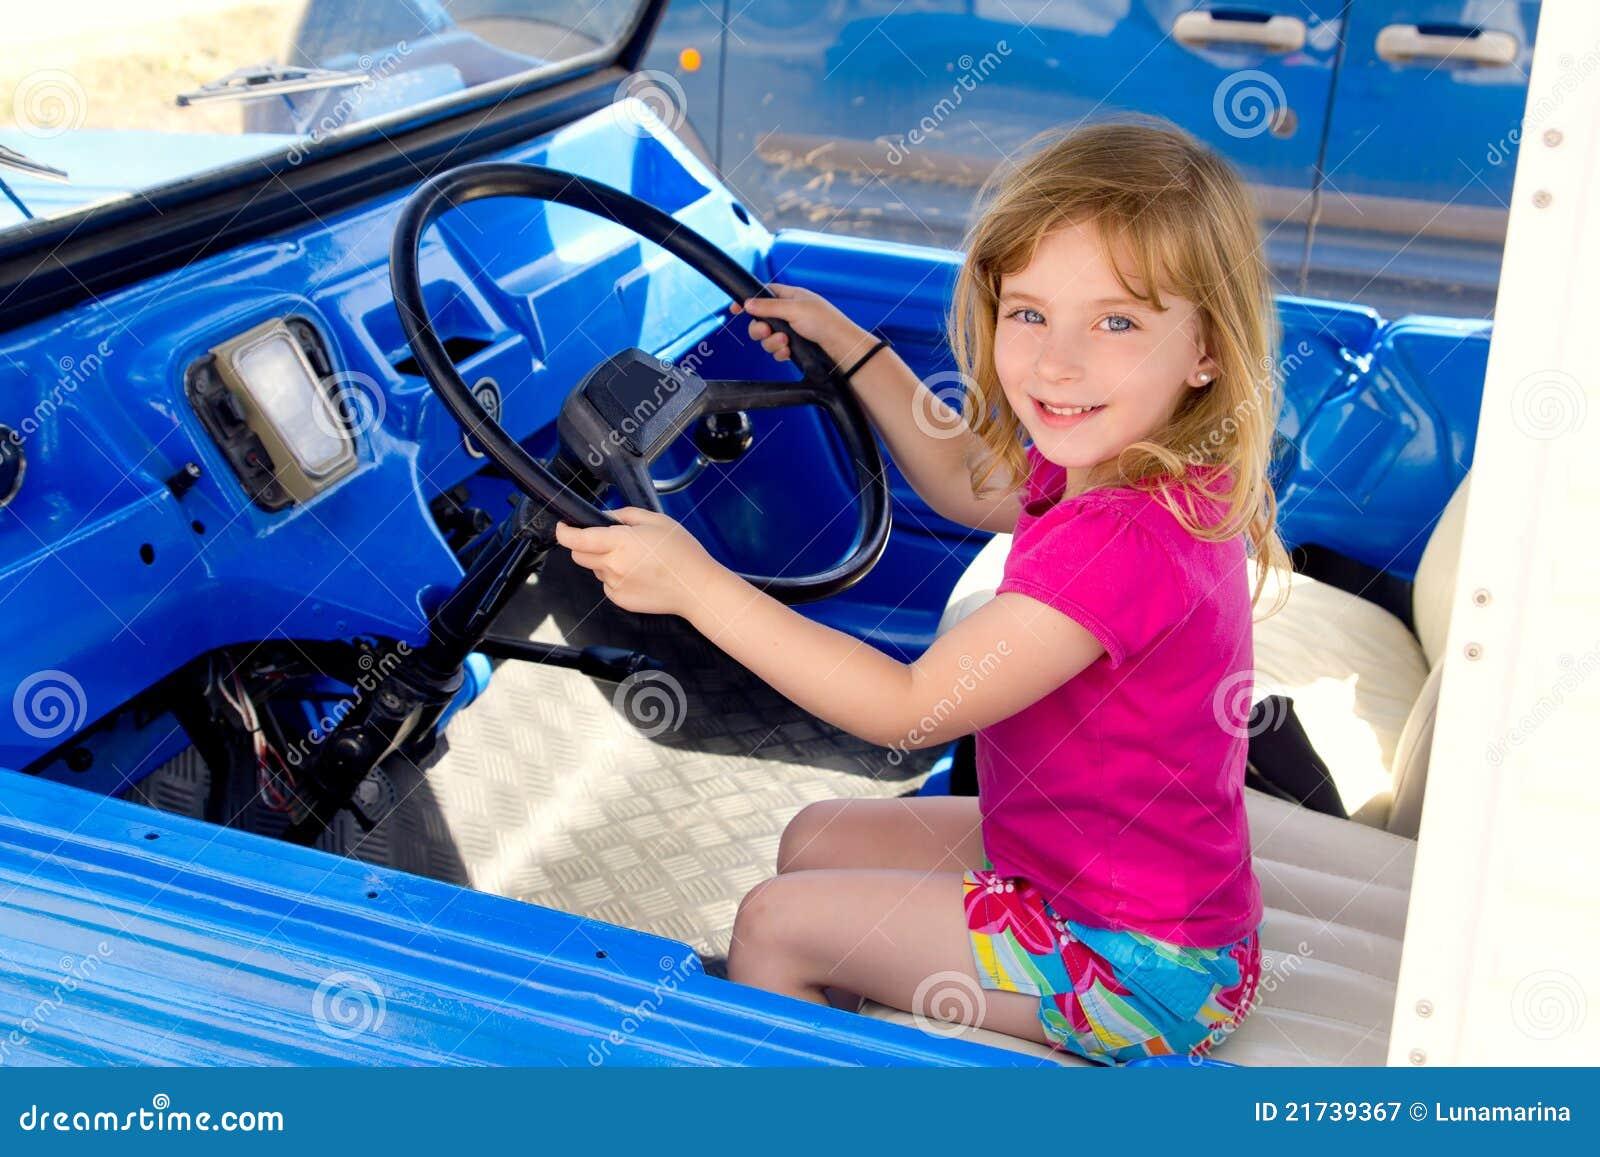 little girl car porn